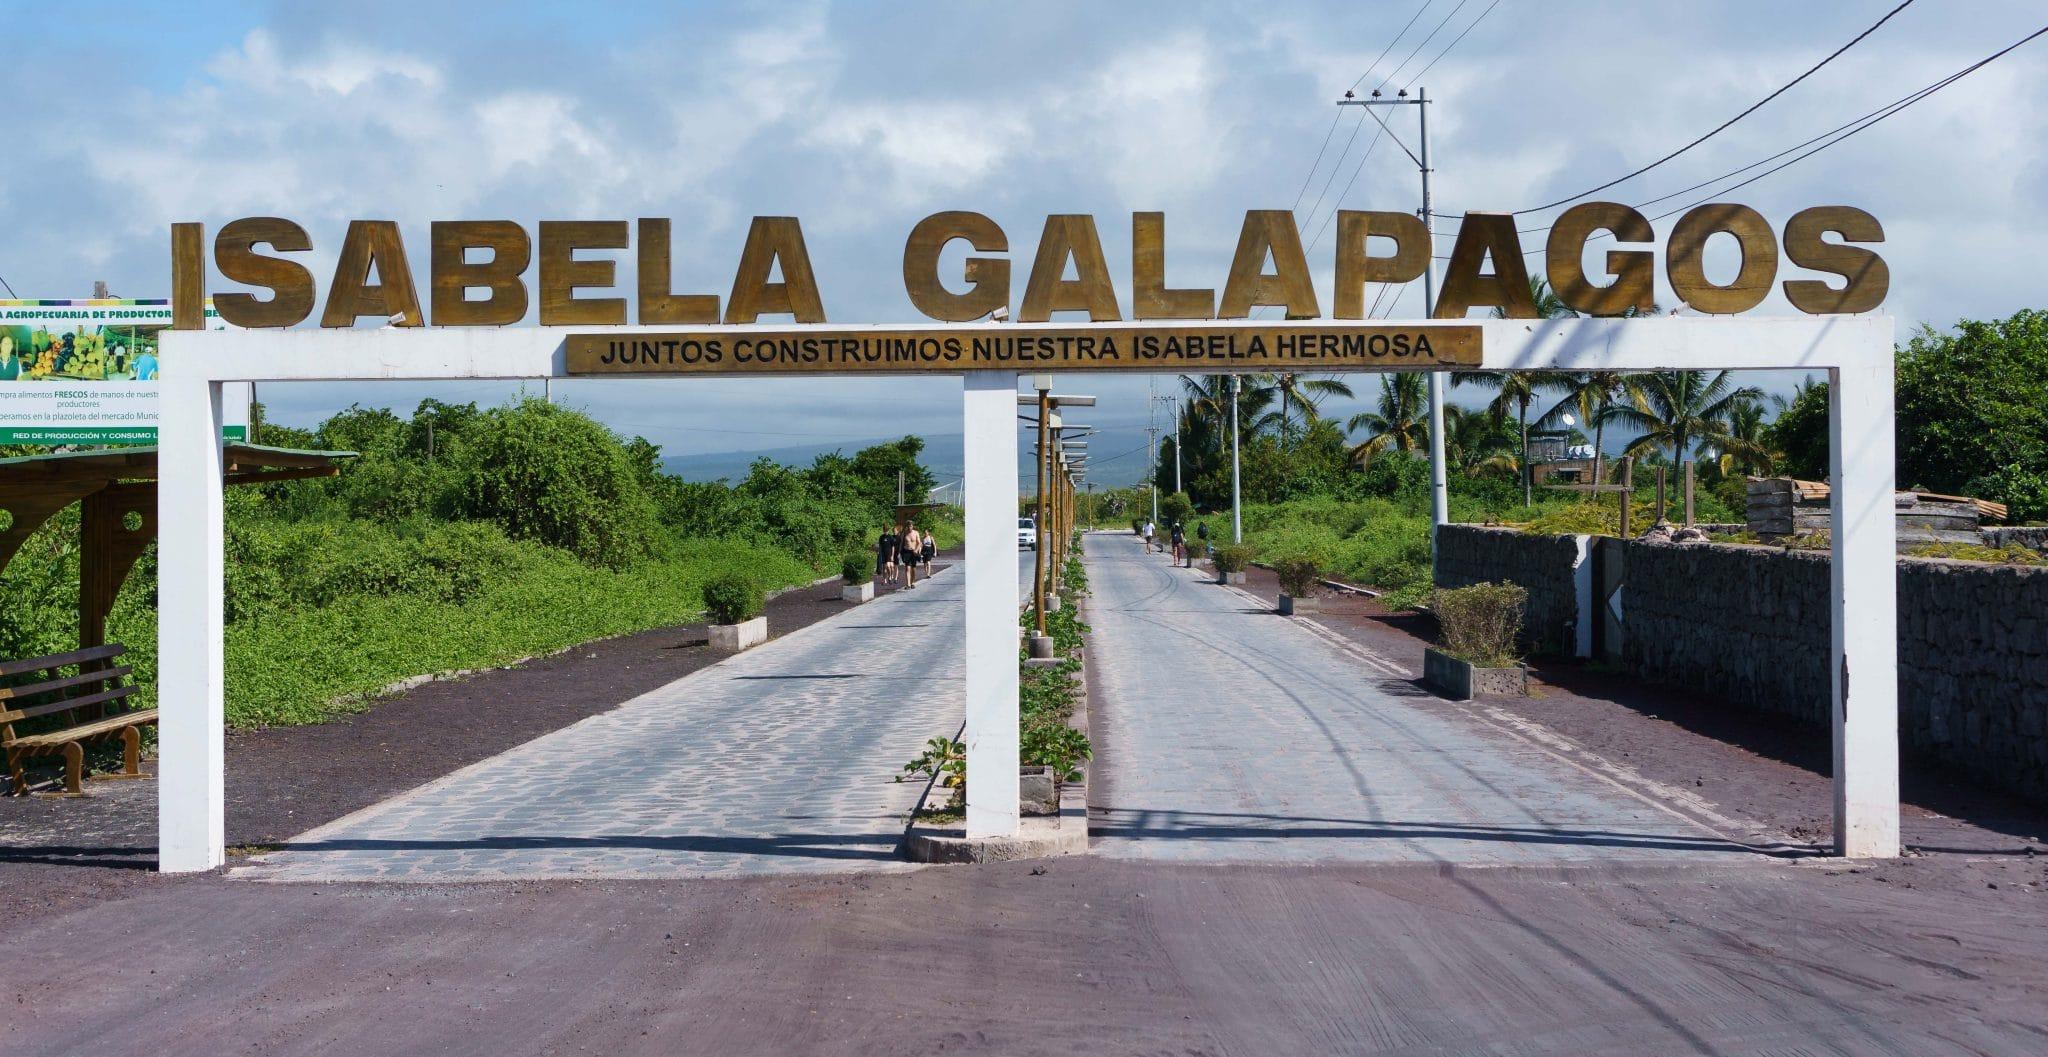 Isabela Galapagos Sign